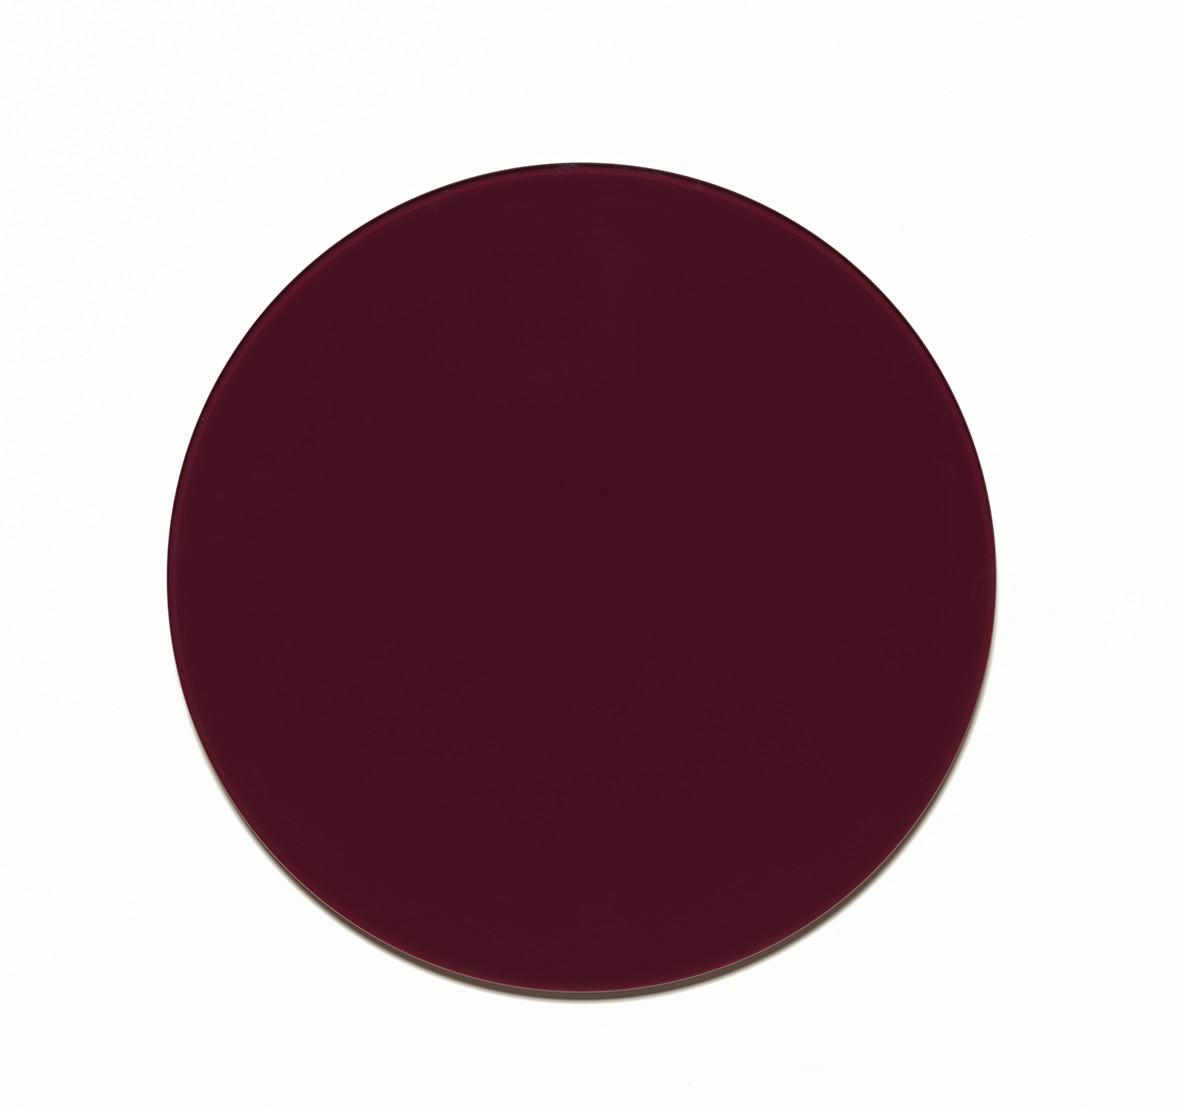 <span class=&#34;link fancybox-details-link&#34;><a href=&#34;/artists/43-r-vigfsson/works/8090/&#34;>View Detail Page</a></span><div class=&#34;artist&#34;><strong>ÞÓR VIGFÚSSON</strong></div> <div class=&#34;title&#34;><em>Untitled</em>, 2011</div> <div class=&#34;medium&#34;>enameled glass</div> <div class=&#34;dimensions&#34;>360° circle, 52 x 52 cm</div> <div class=&#34;edition_details&#34;></div>